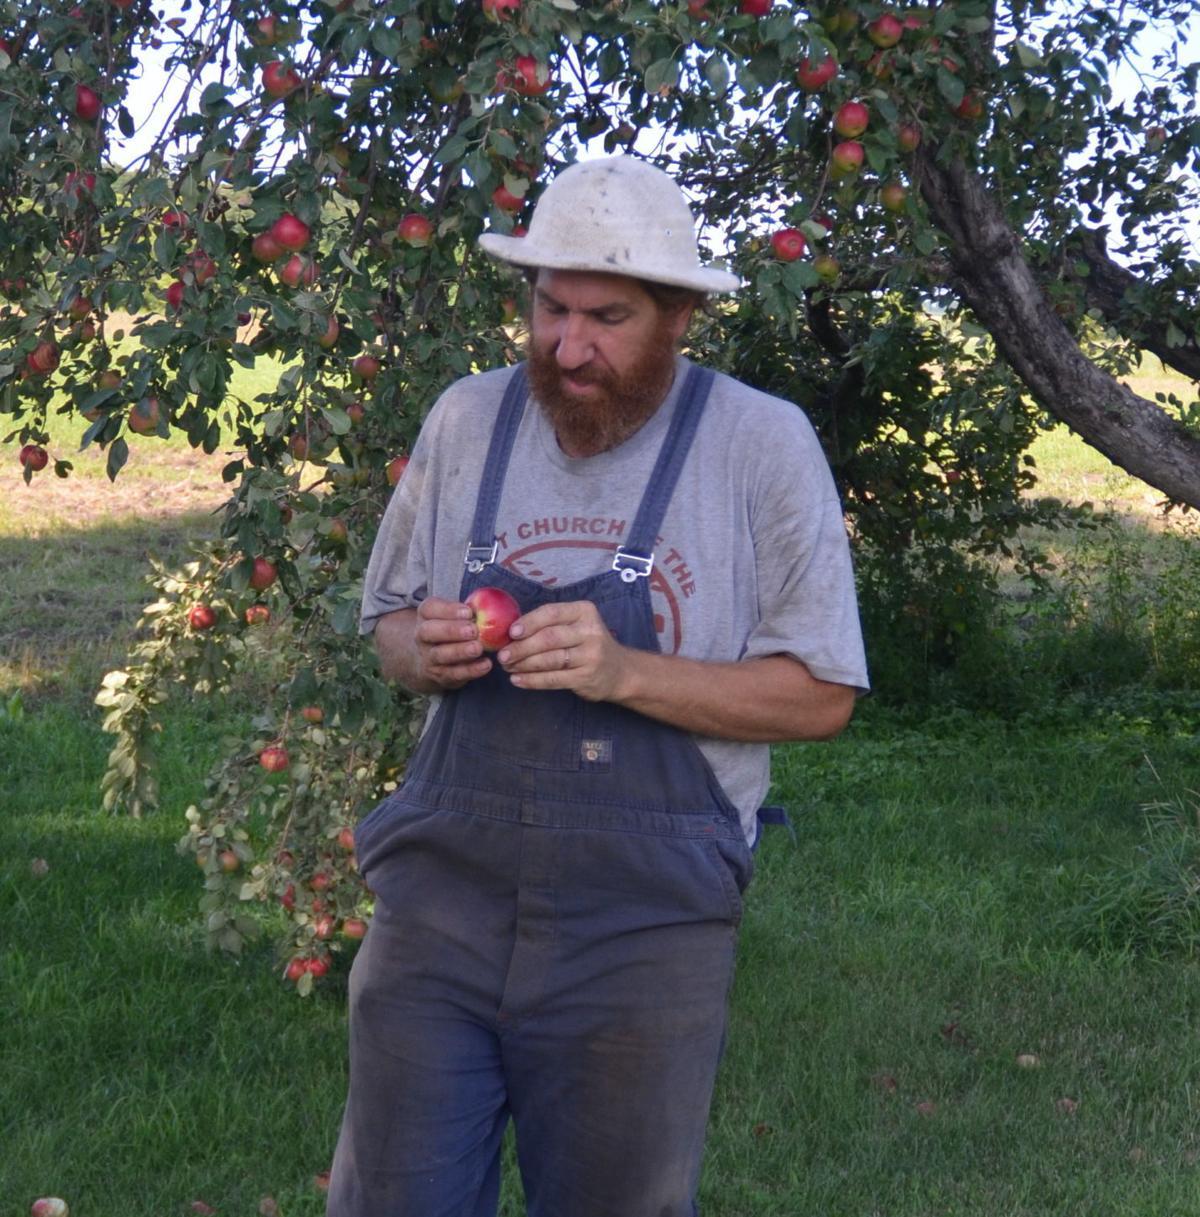 Daniel's apple